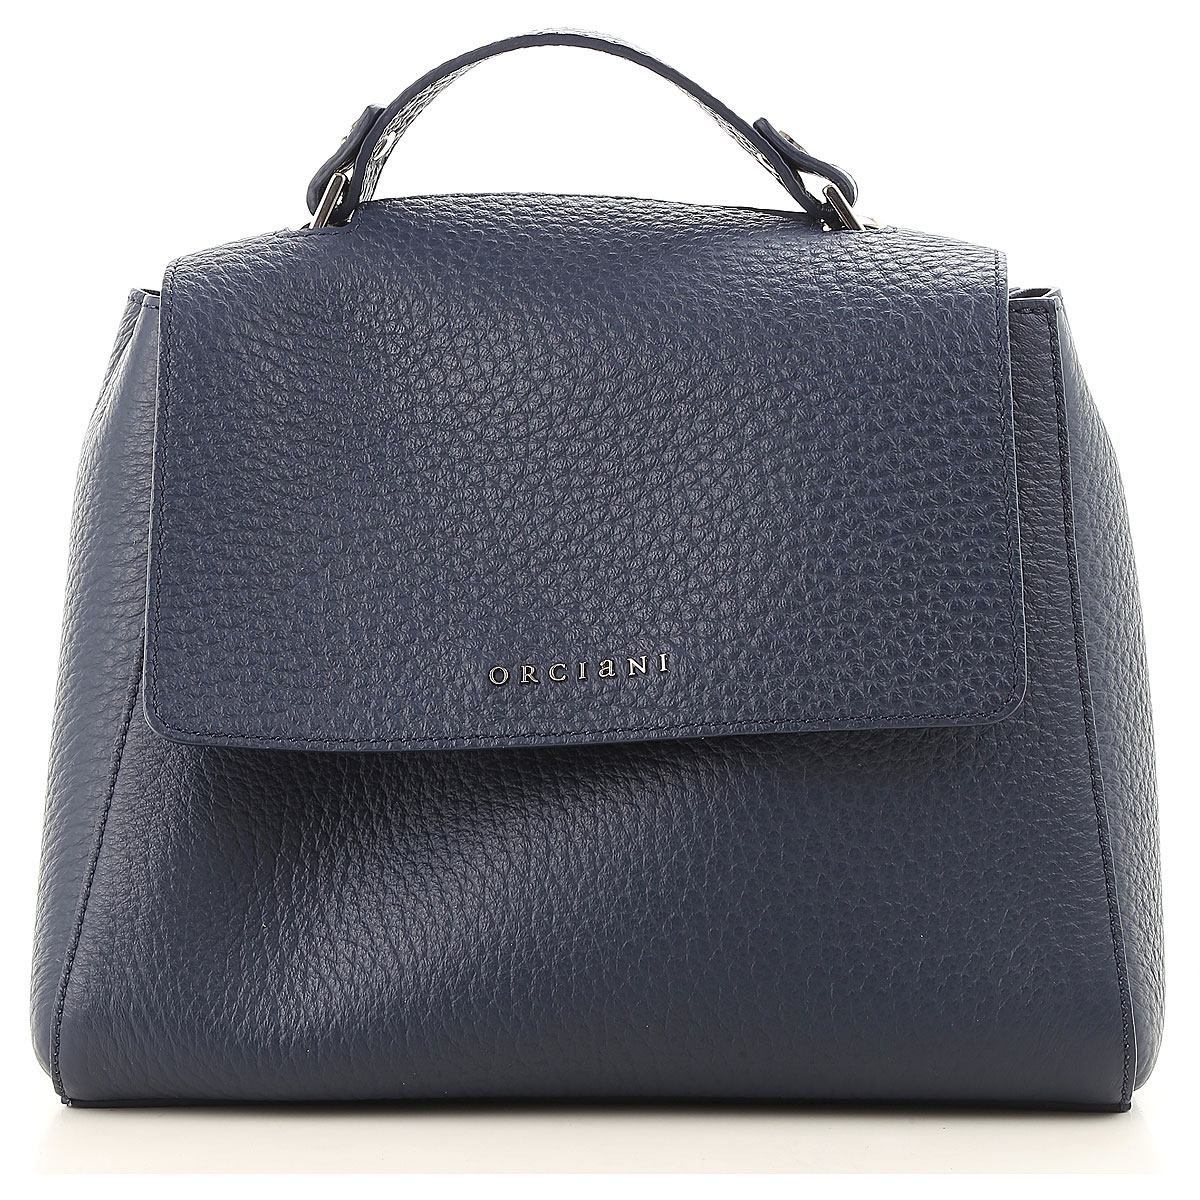 Image of Orciani Shoulder Bag for Women, Blue, Leather, 2017